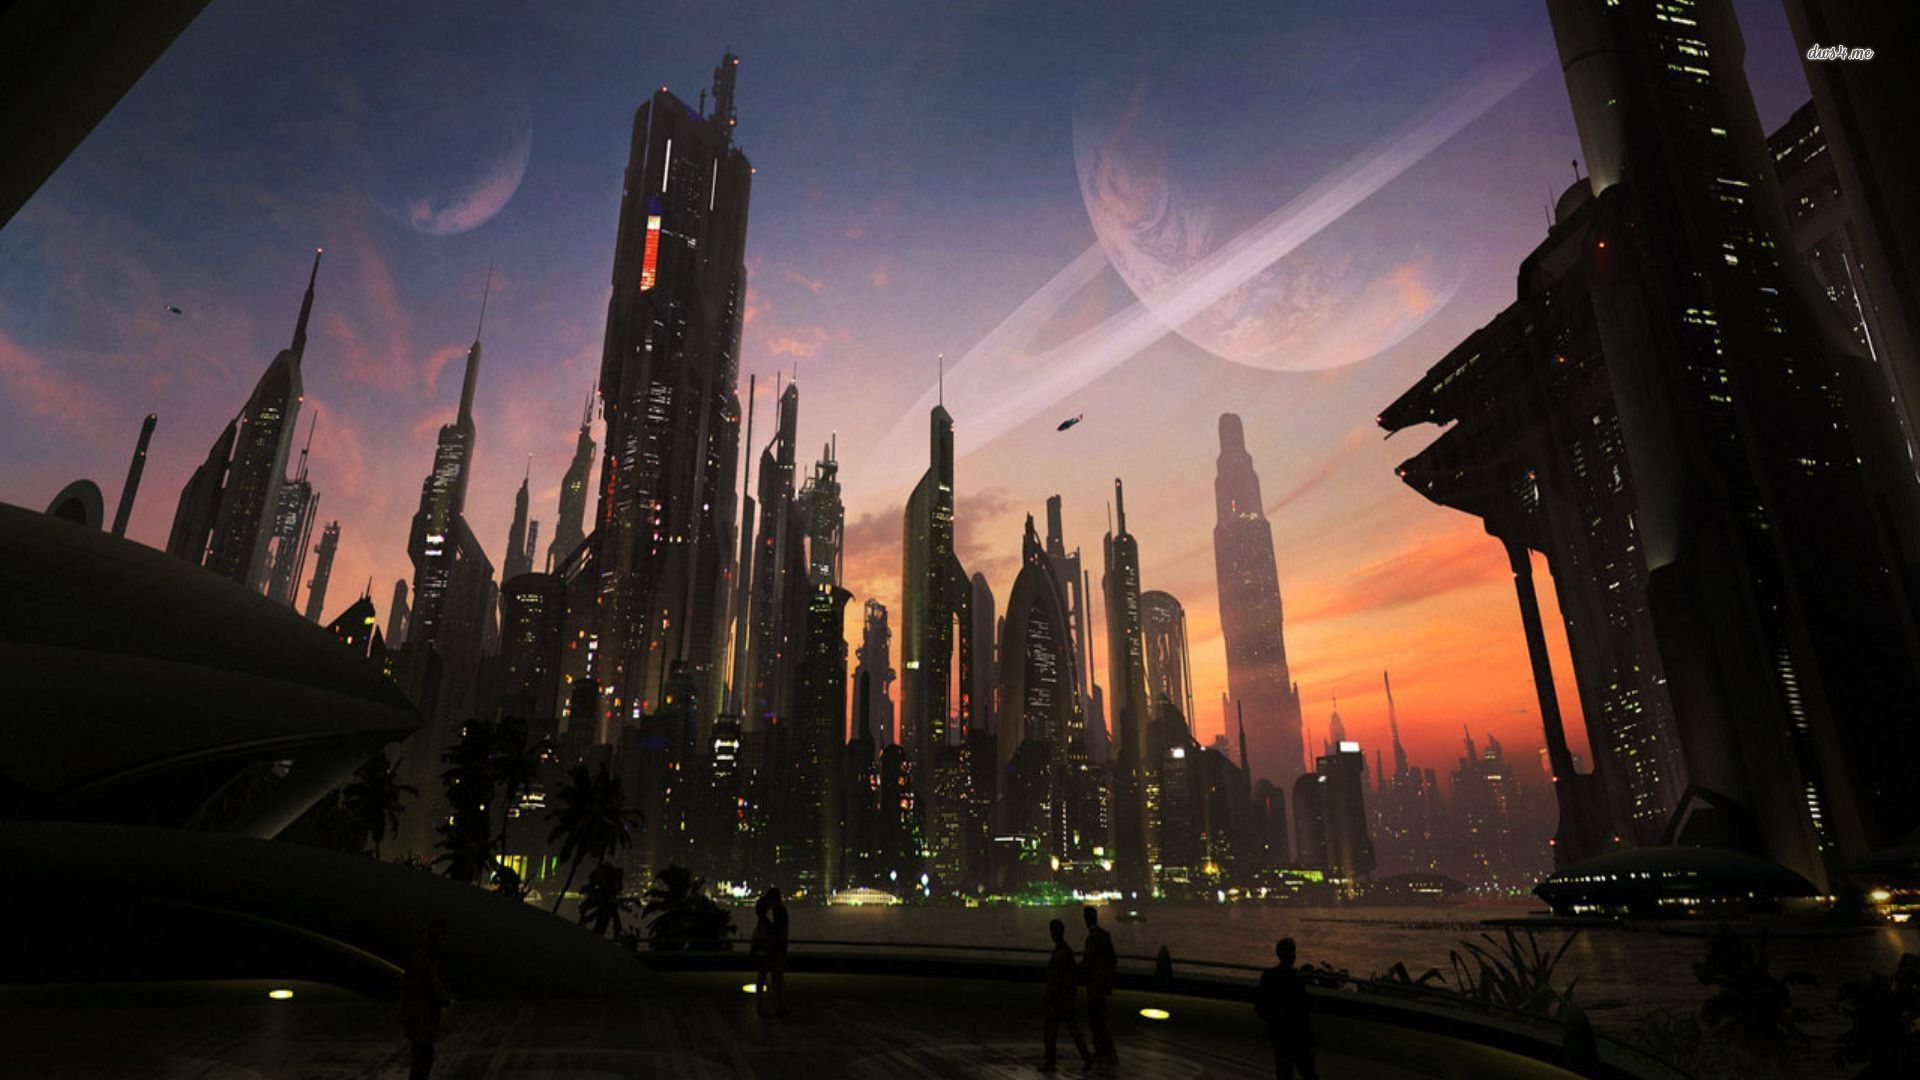 Futuristic City Wallpaper Hd: Top HD Planet Wallpapers